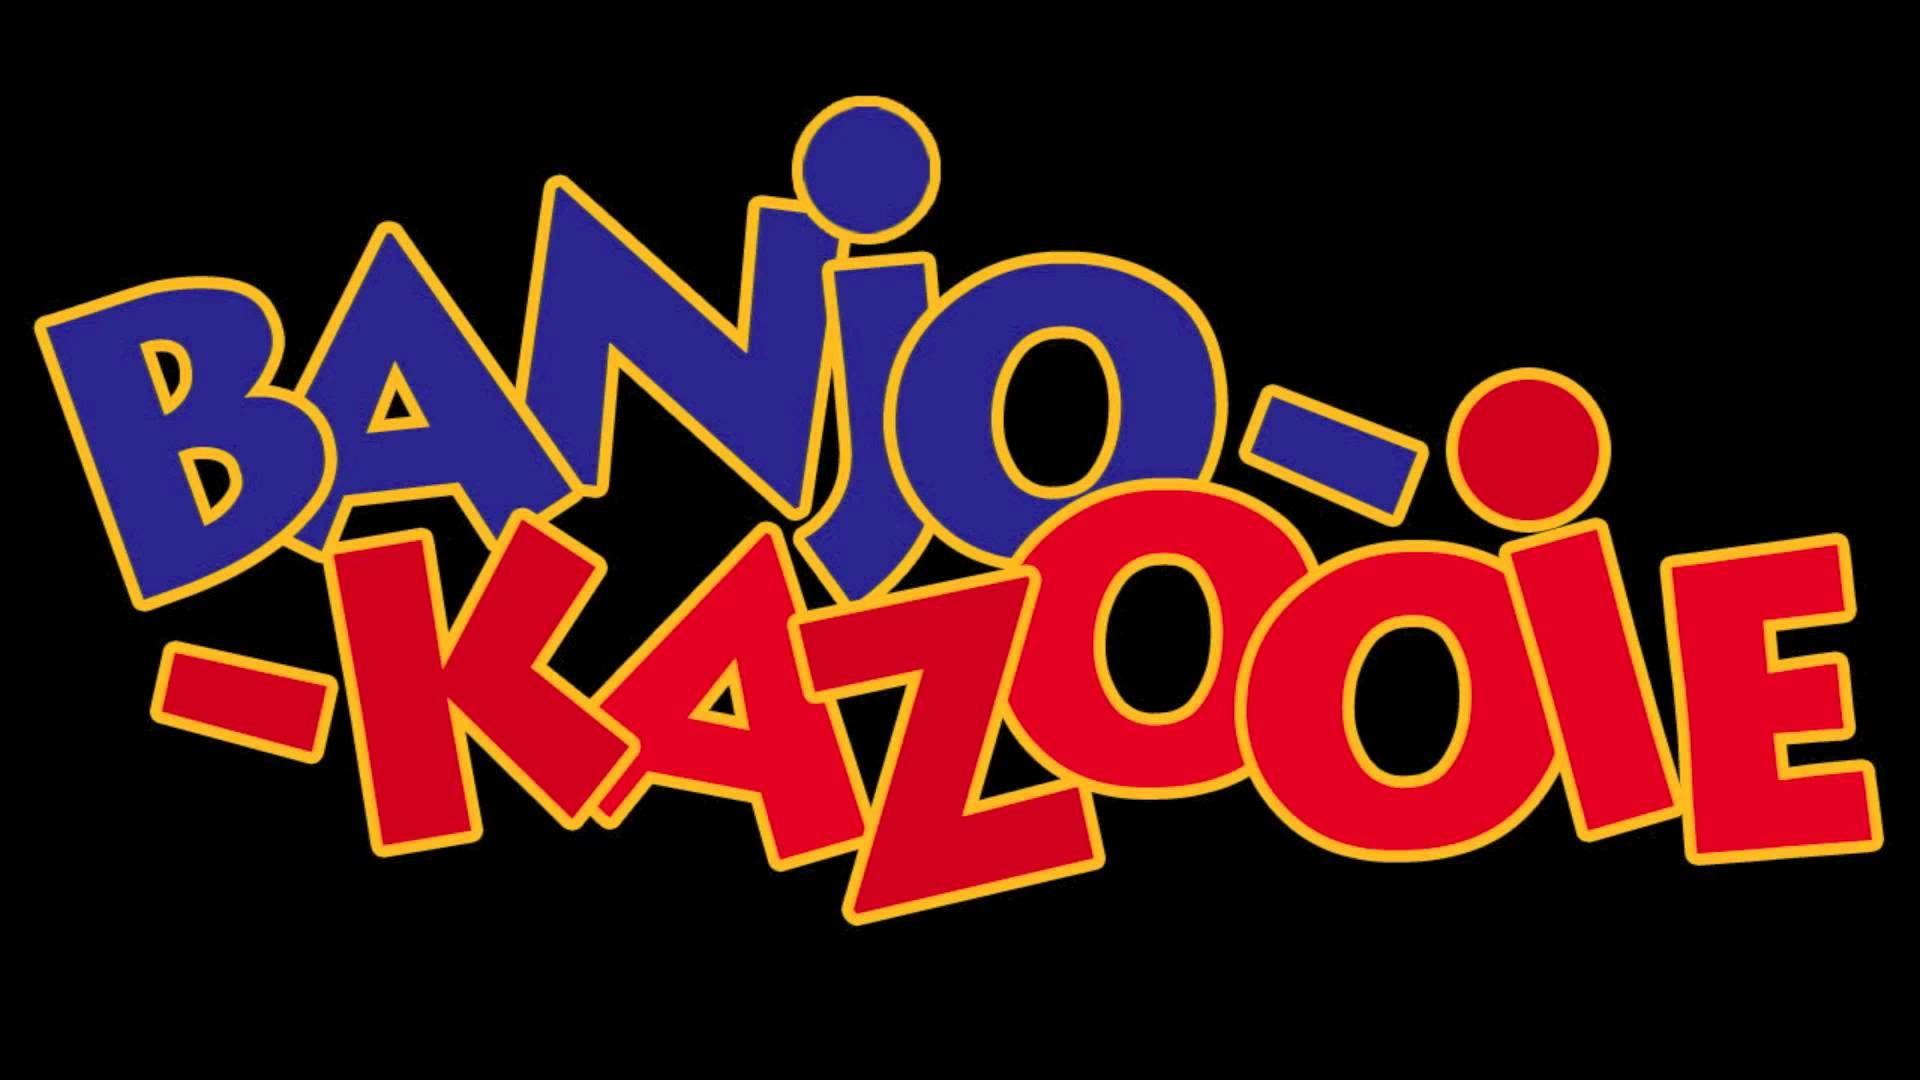 Spiral Mountain - Banjo-Kazooie | Video game soundtracks